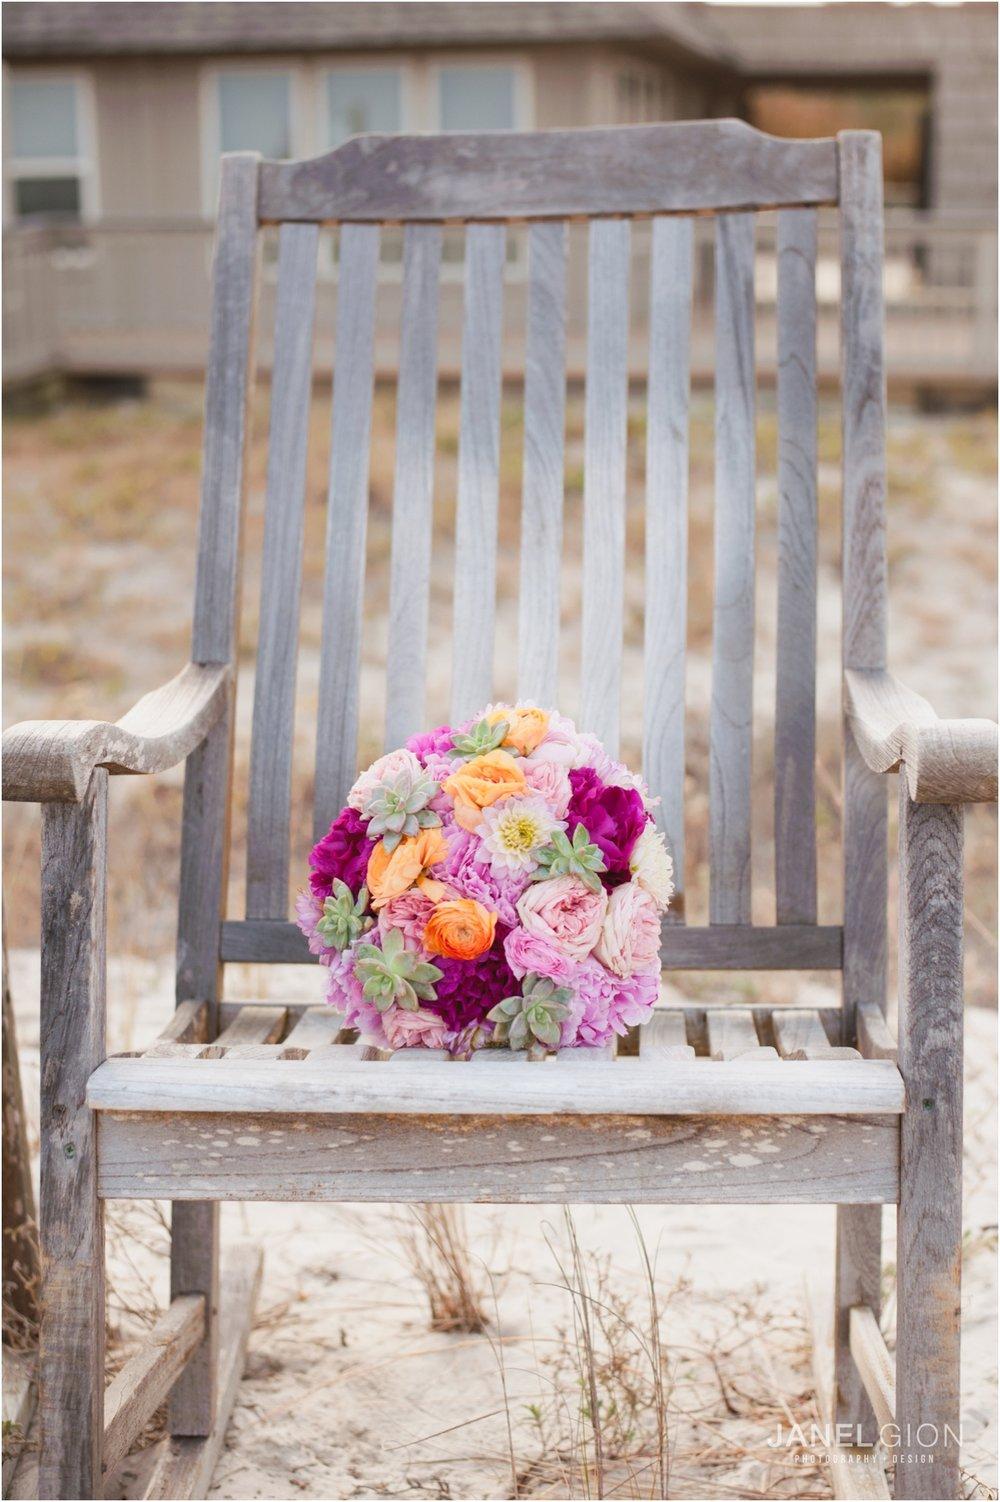 Janel-Gion-Hilton-Head-Island-SC-Destination-Wedding-Photographer_0034